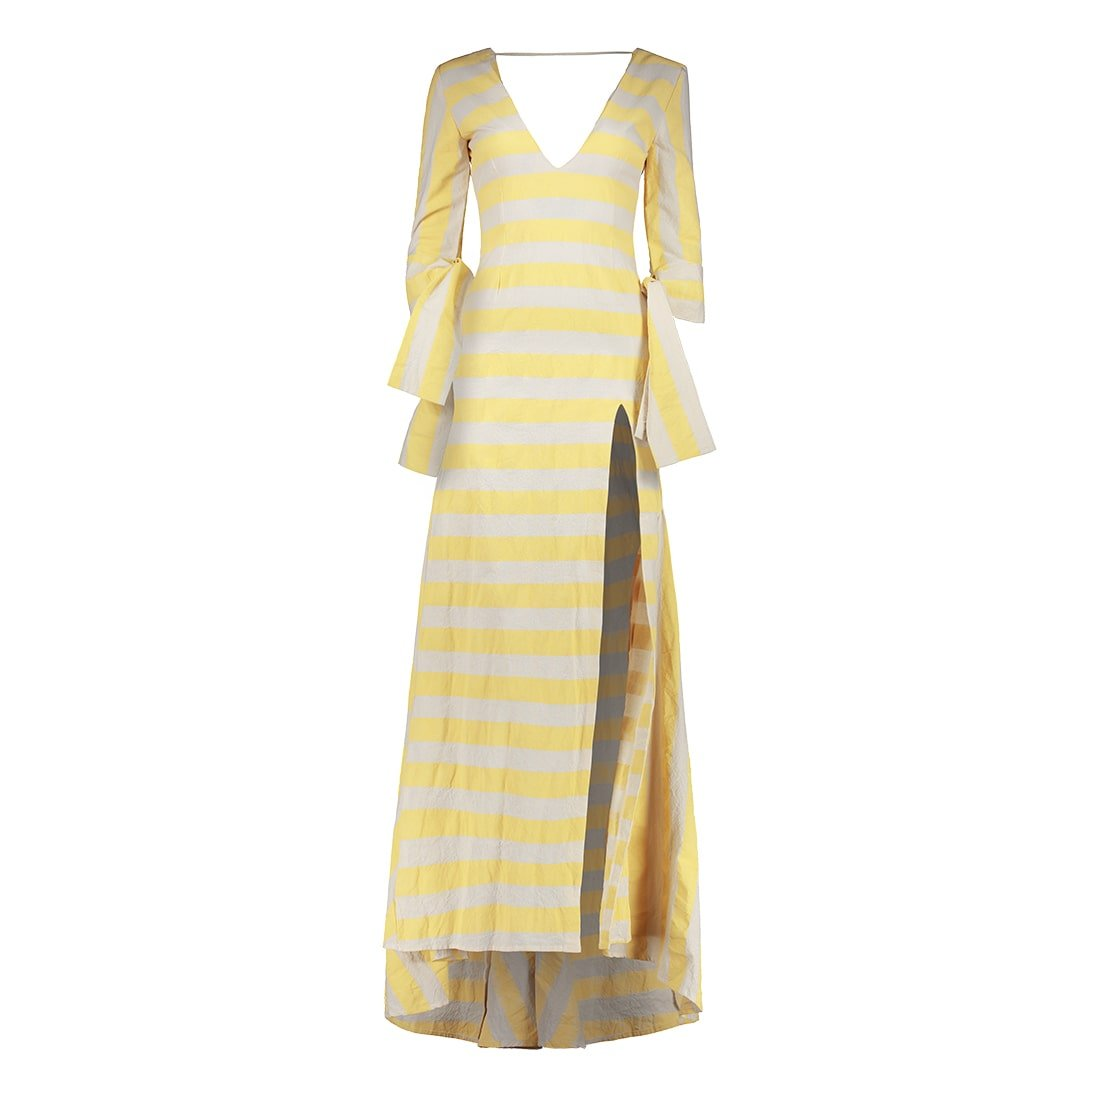 100% cotton floor-length, v-neck gown 1